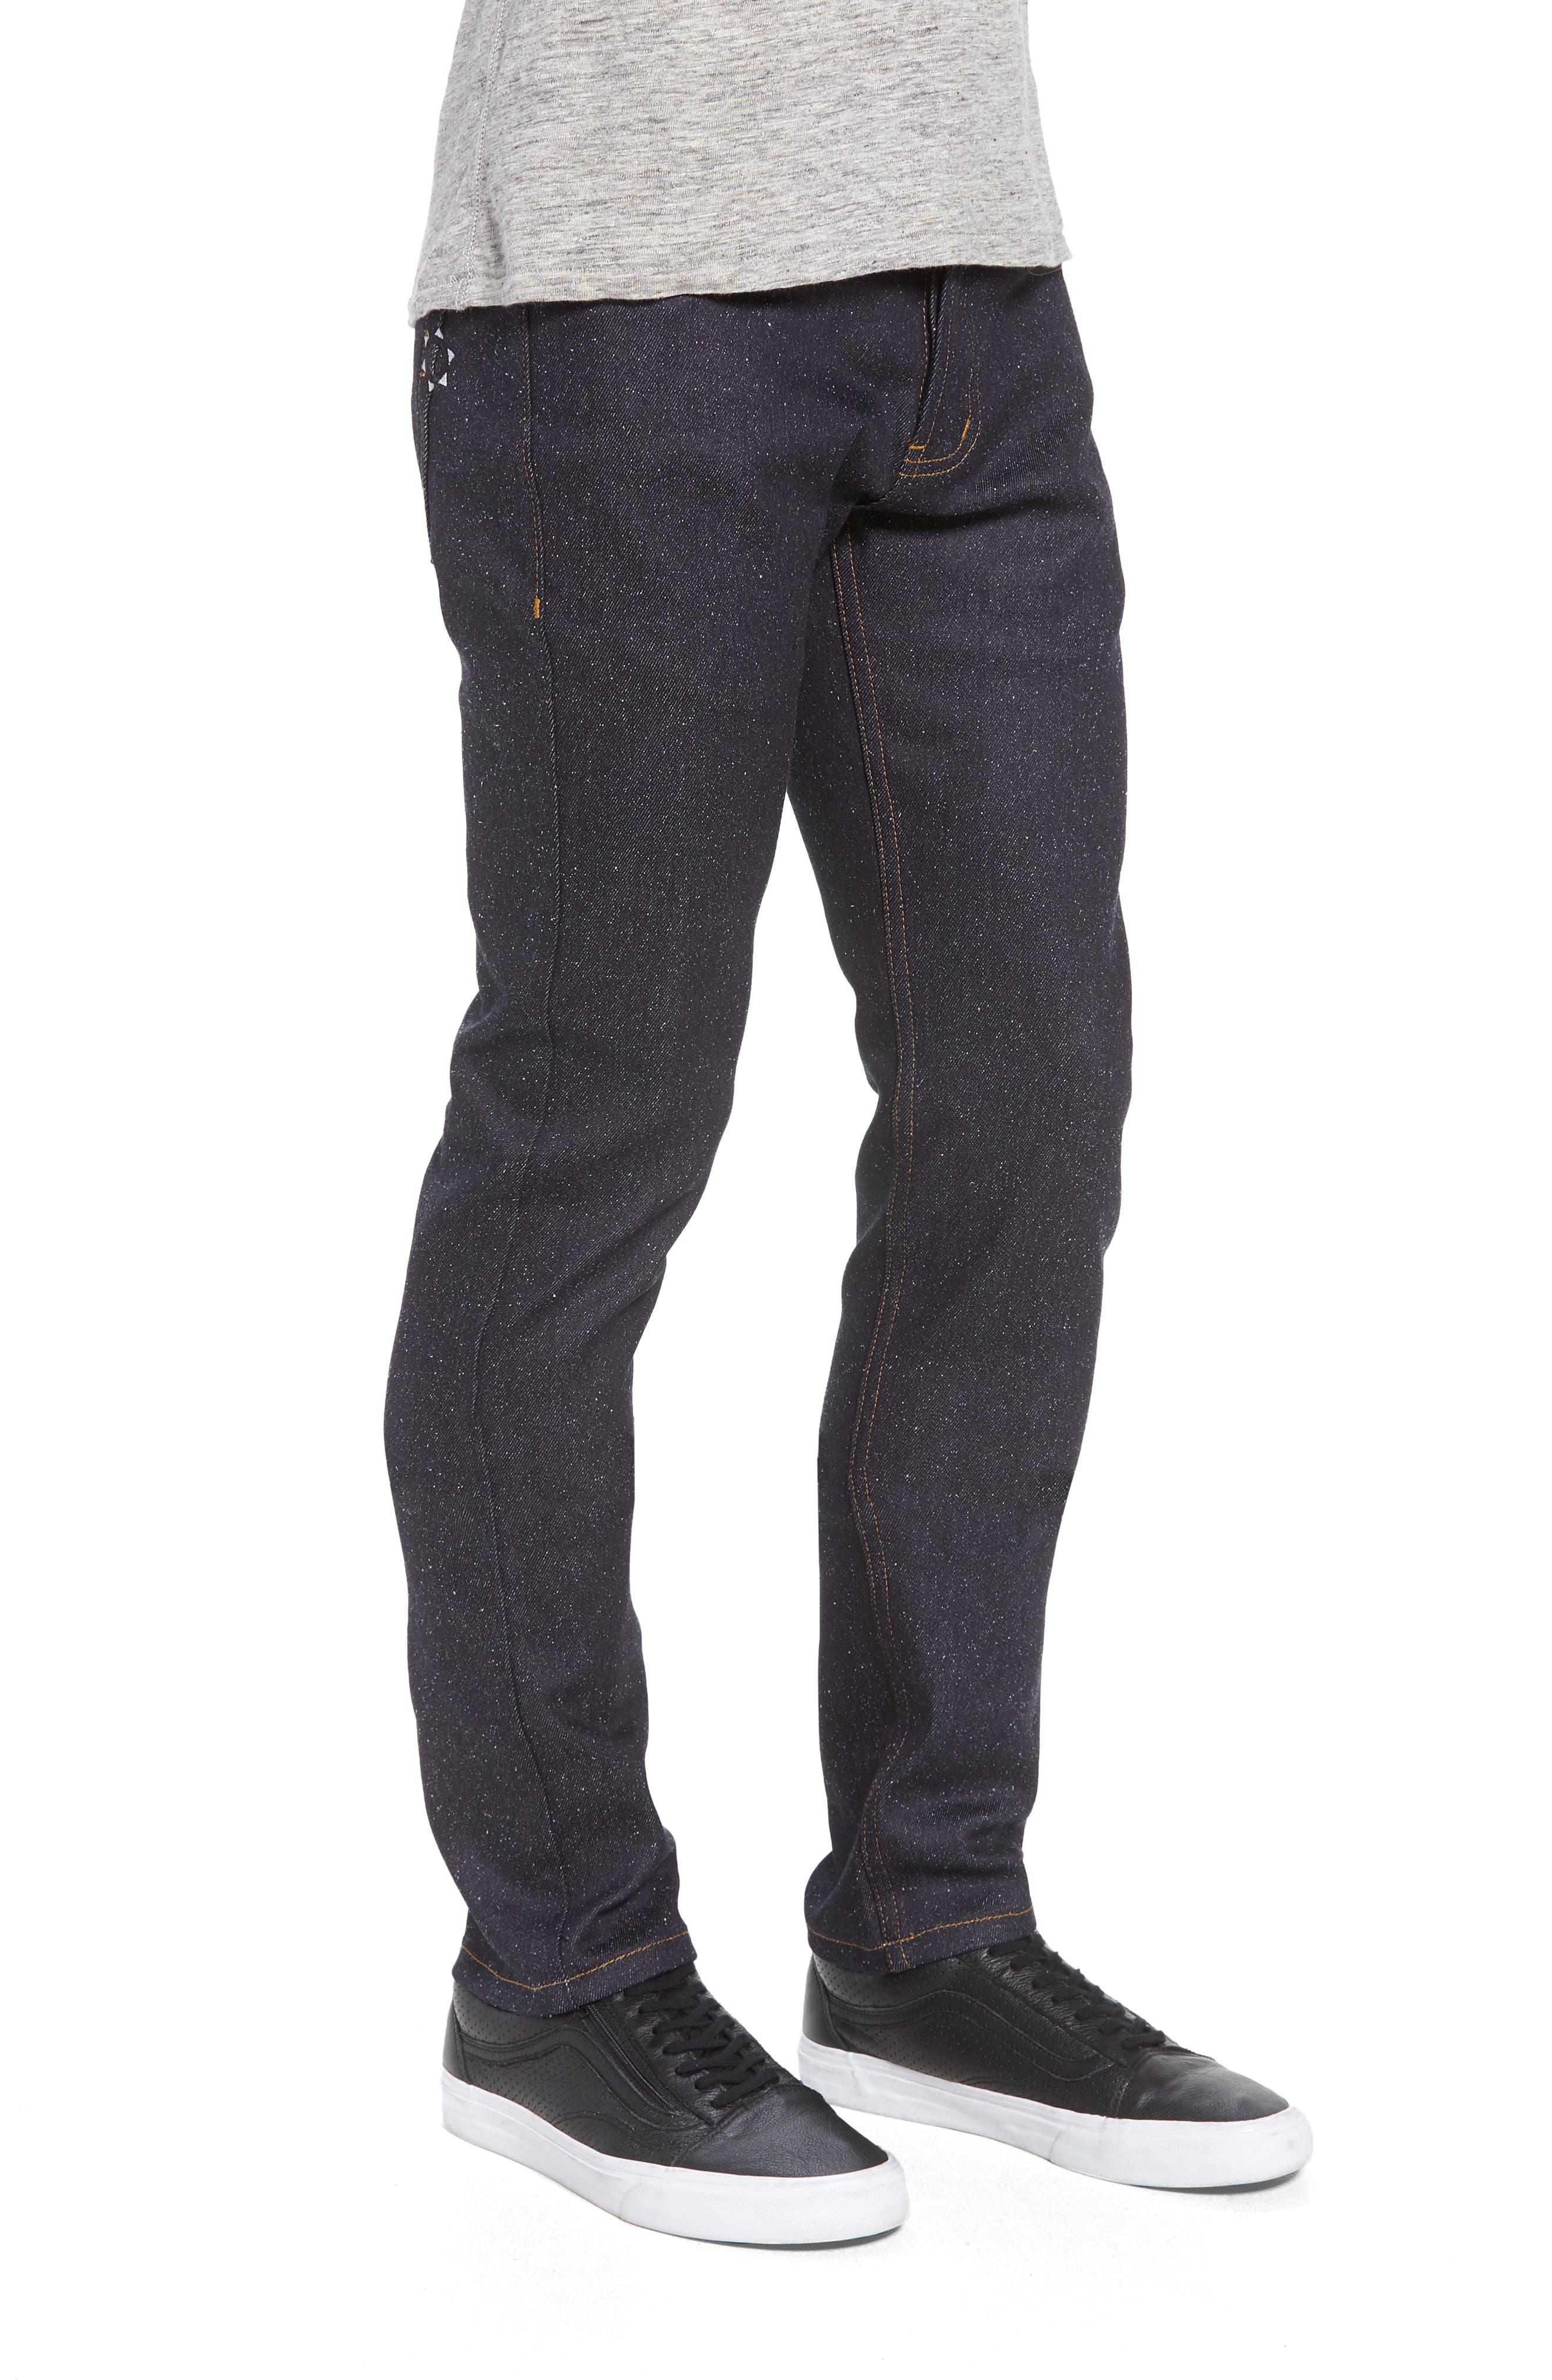 Super Skinny Guy Skinny Fit Jeans,                             Alternate thumbnail 3, color,                             401